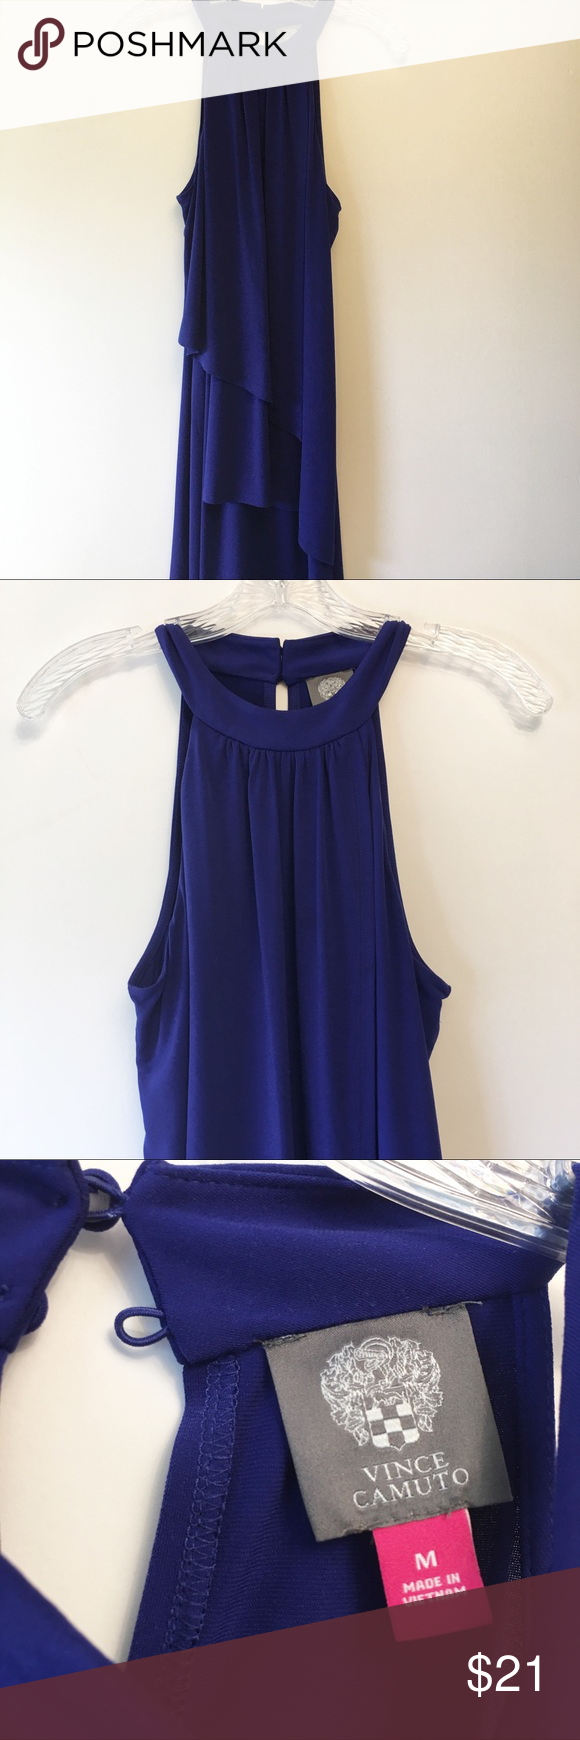 Vince Camuto Sleeveless Blue Dress Medium Vince Camuto Colbalt Blue Mini Dress Sleeveless Lightweight And Blue Sleeveless Dress Blue Midi Dress Clothes Design [ 1740 x 580 Pixel ]